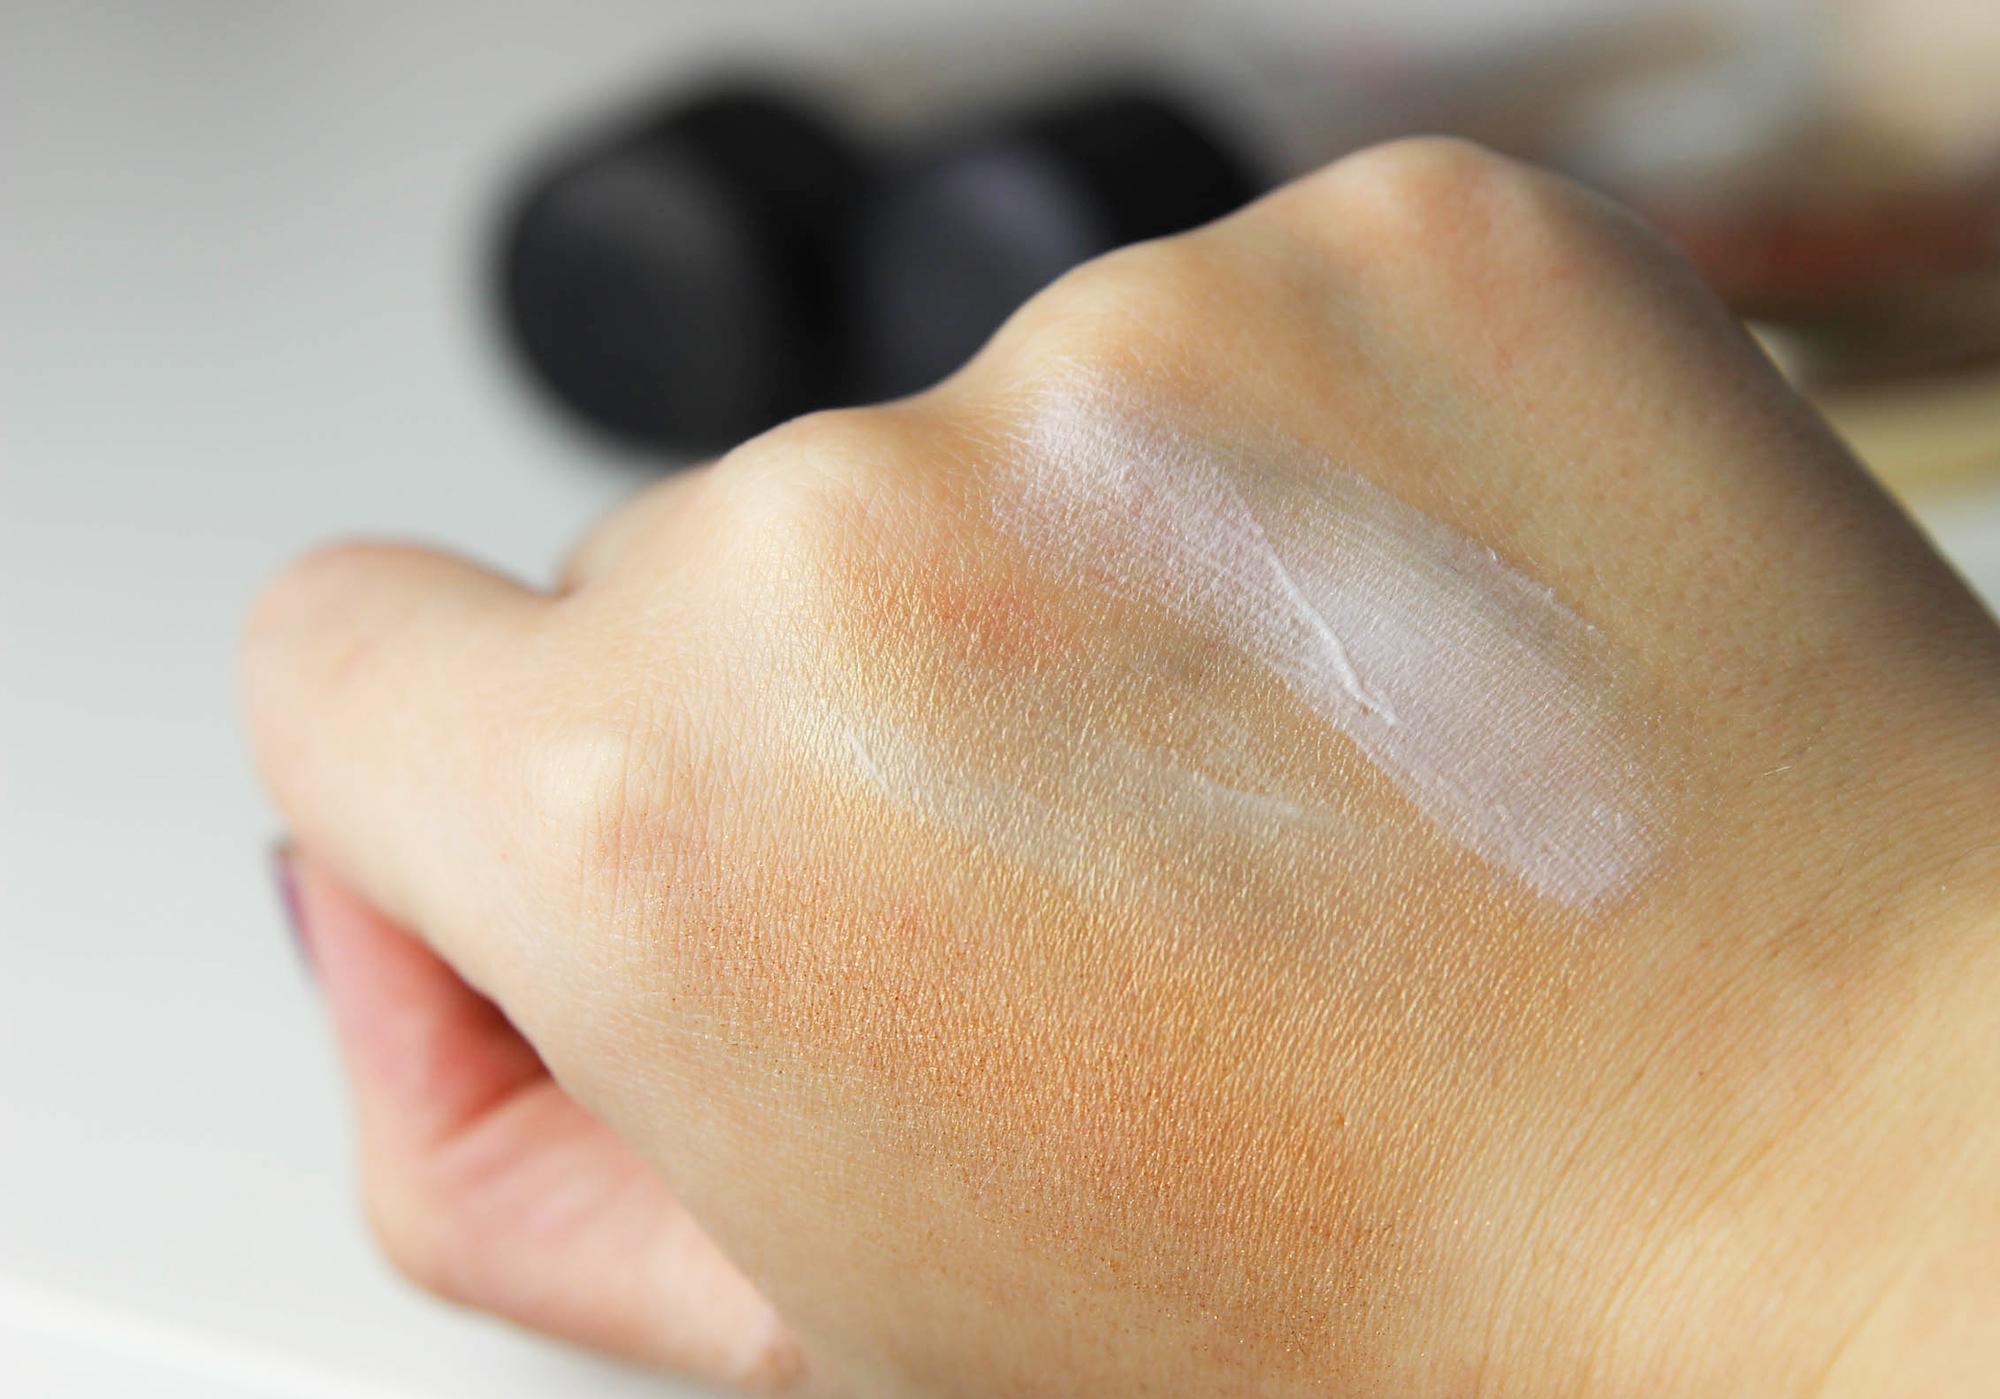 maquillage-malade-8